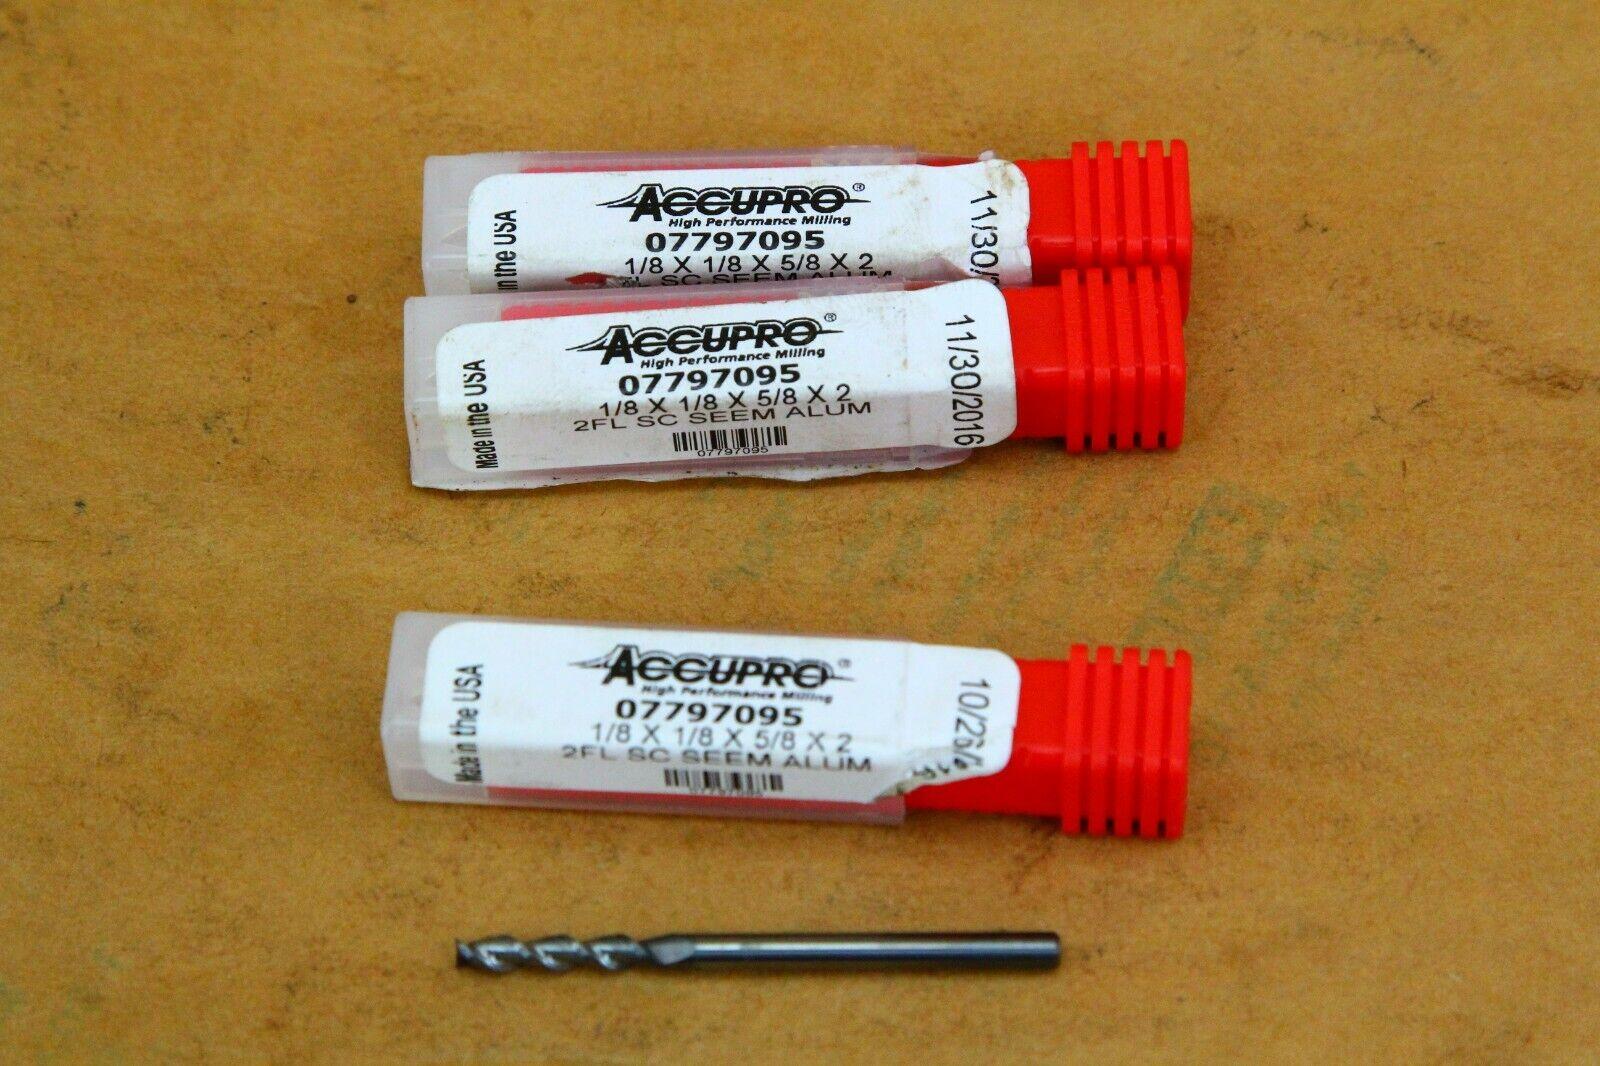 "4FL Accupro 07771371 Carbide Sq 3//16 x 3//16 x 5//8 x 2/"" USA TiCN End Mill"